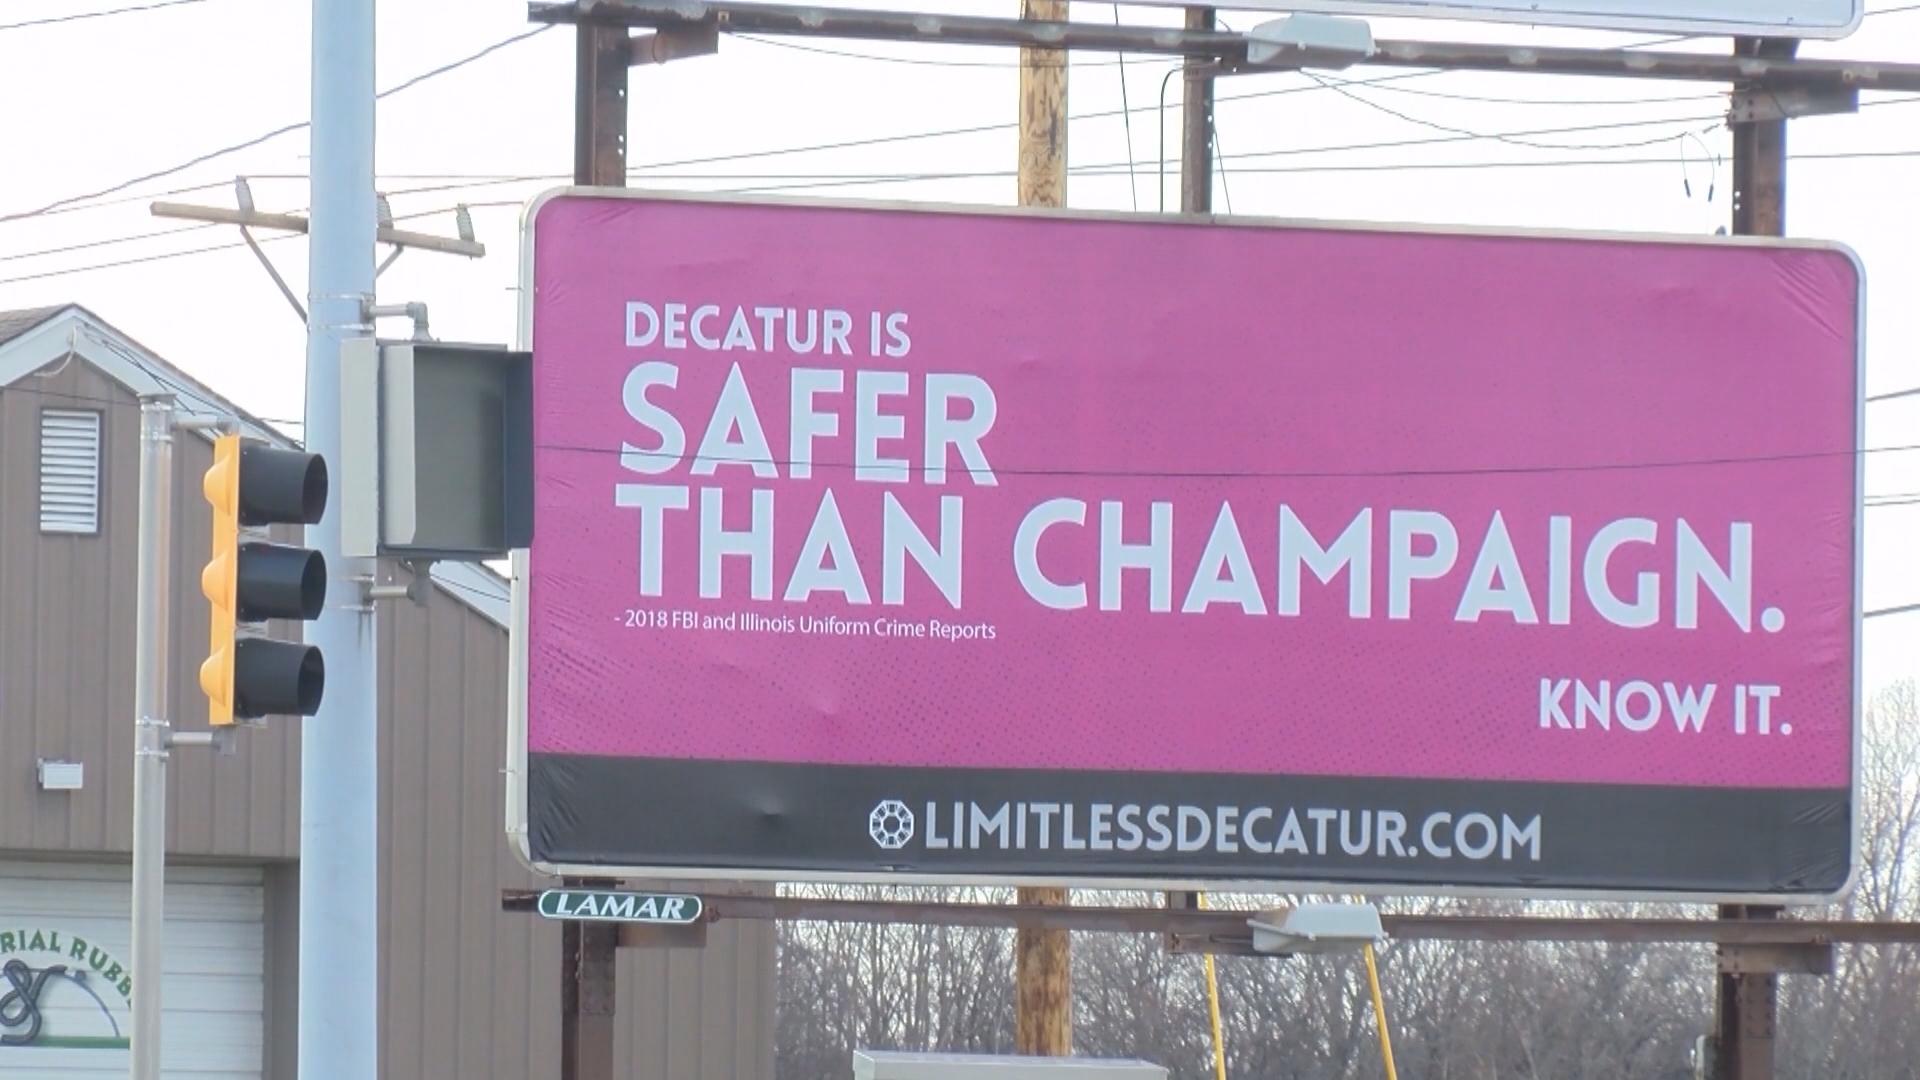 decatur billboards_1554153806122.jpg.jpg